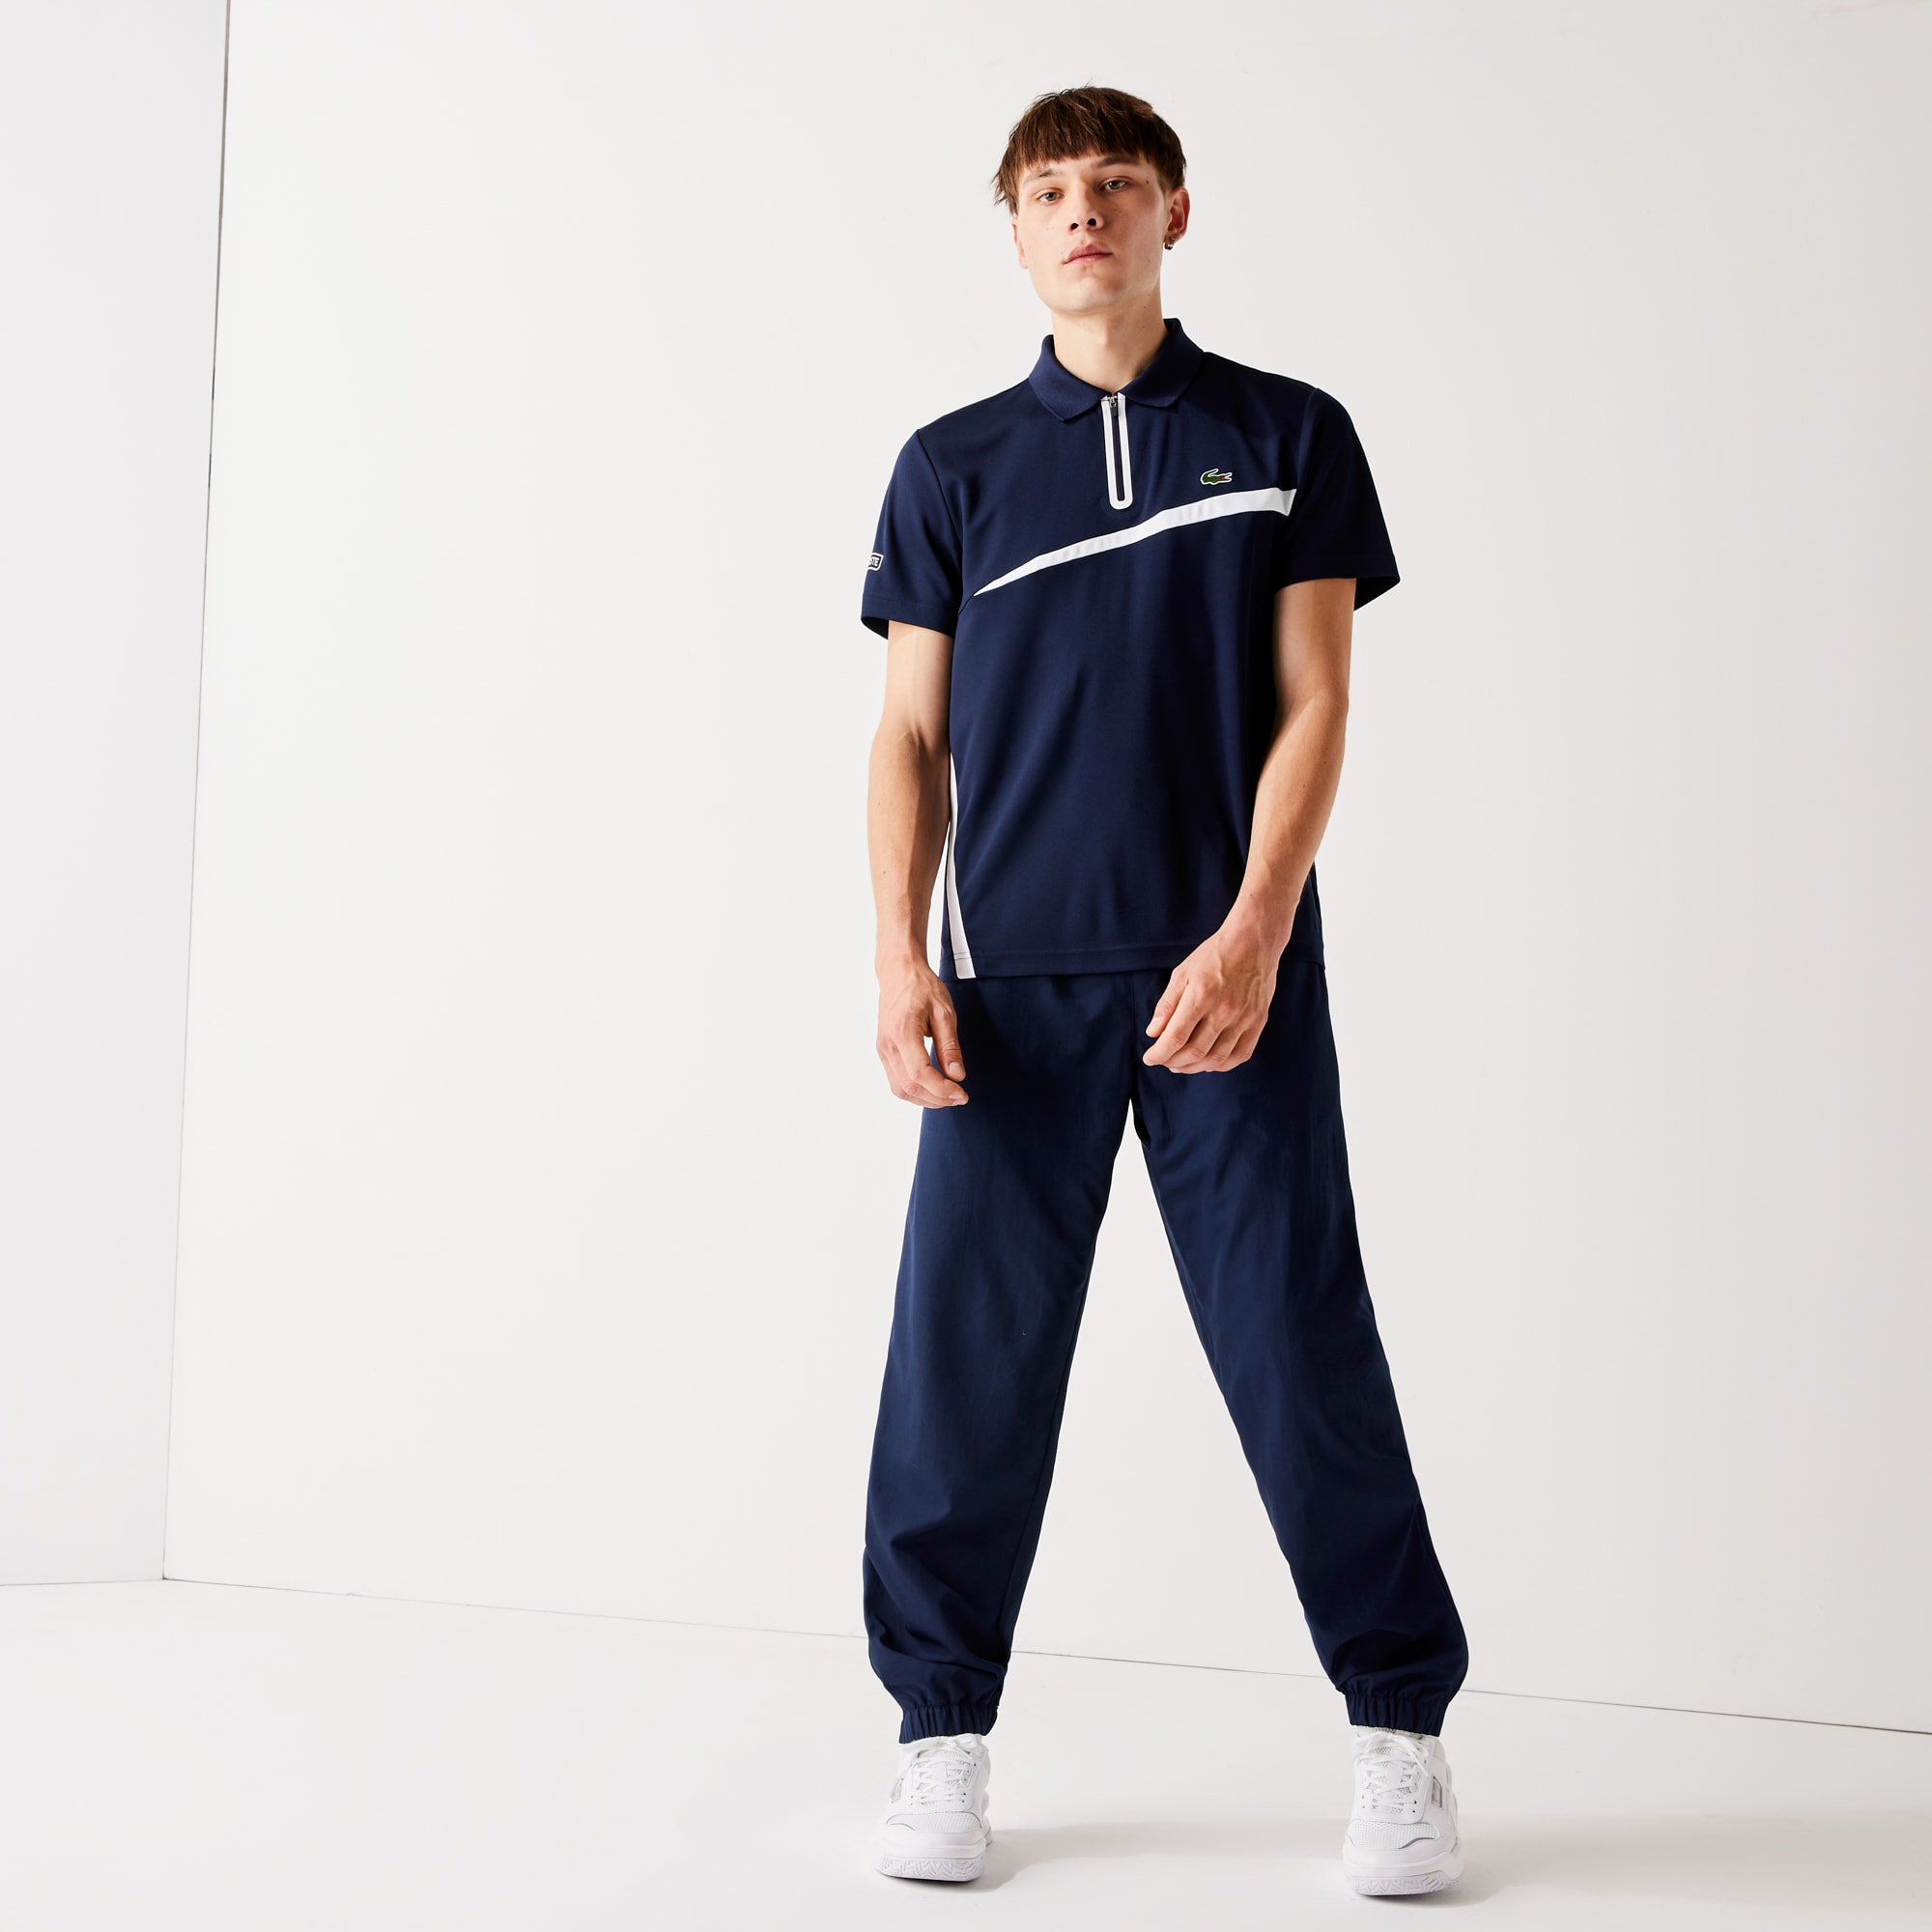 2a36da20 Men's Lacoste SPORT Tennis trackpants in diamond weave taffeta | LACOSTE